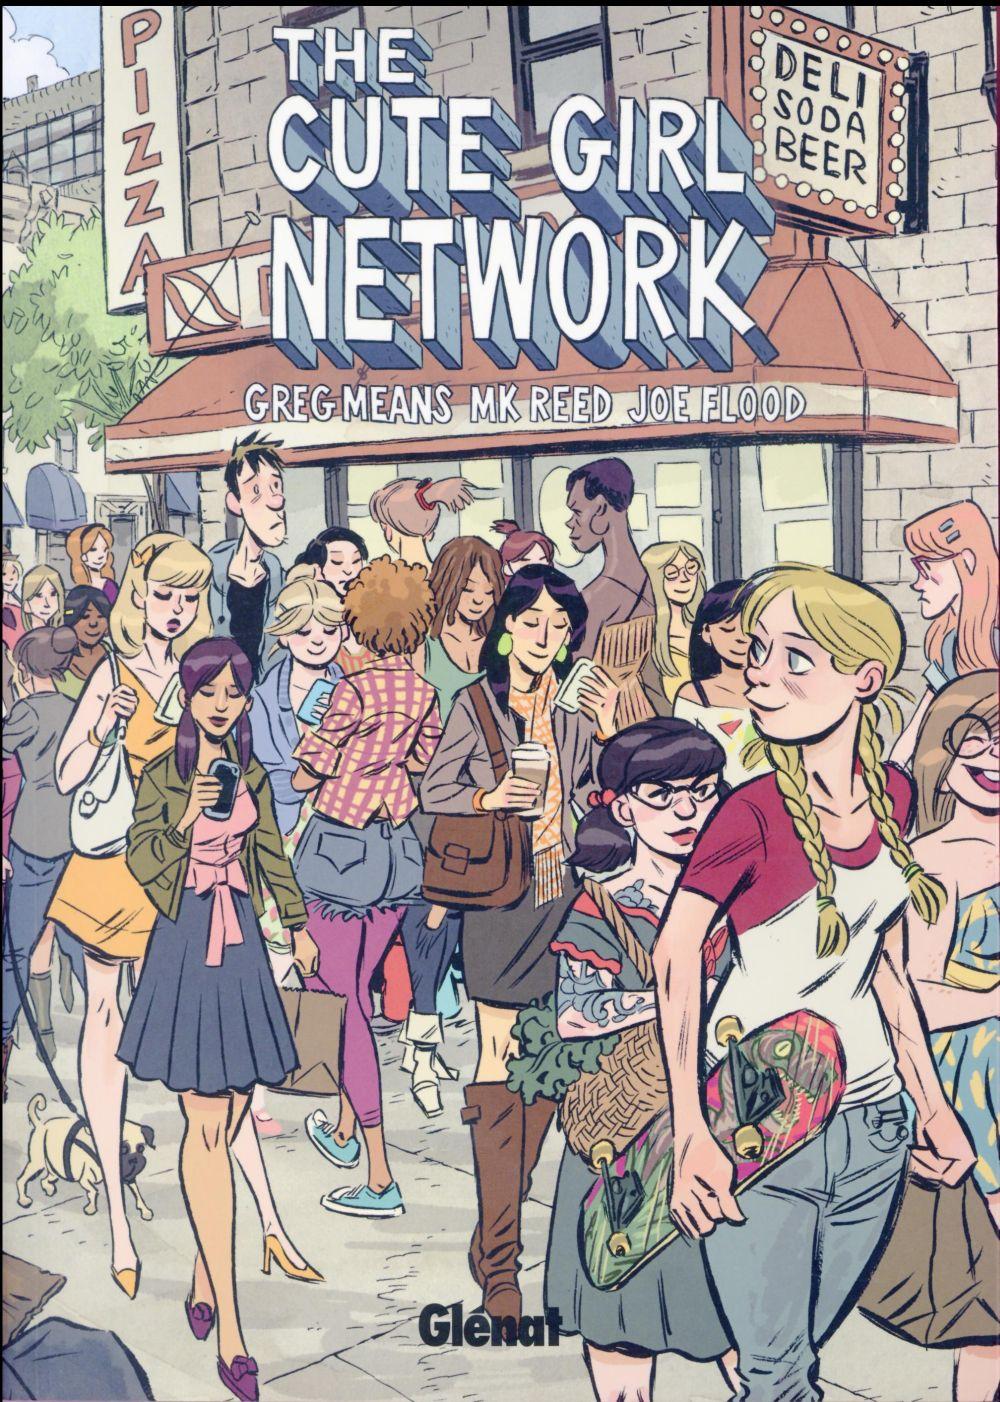 [The ]cute girl network